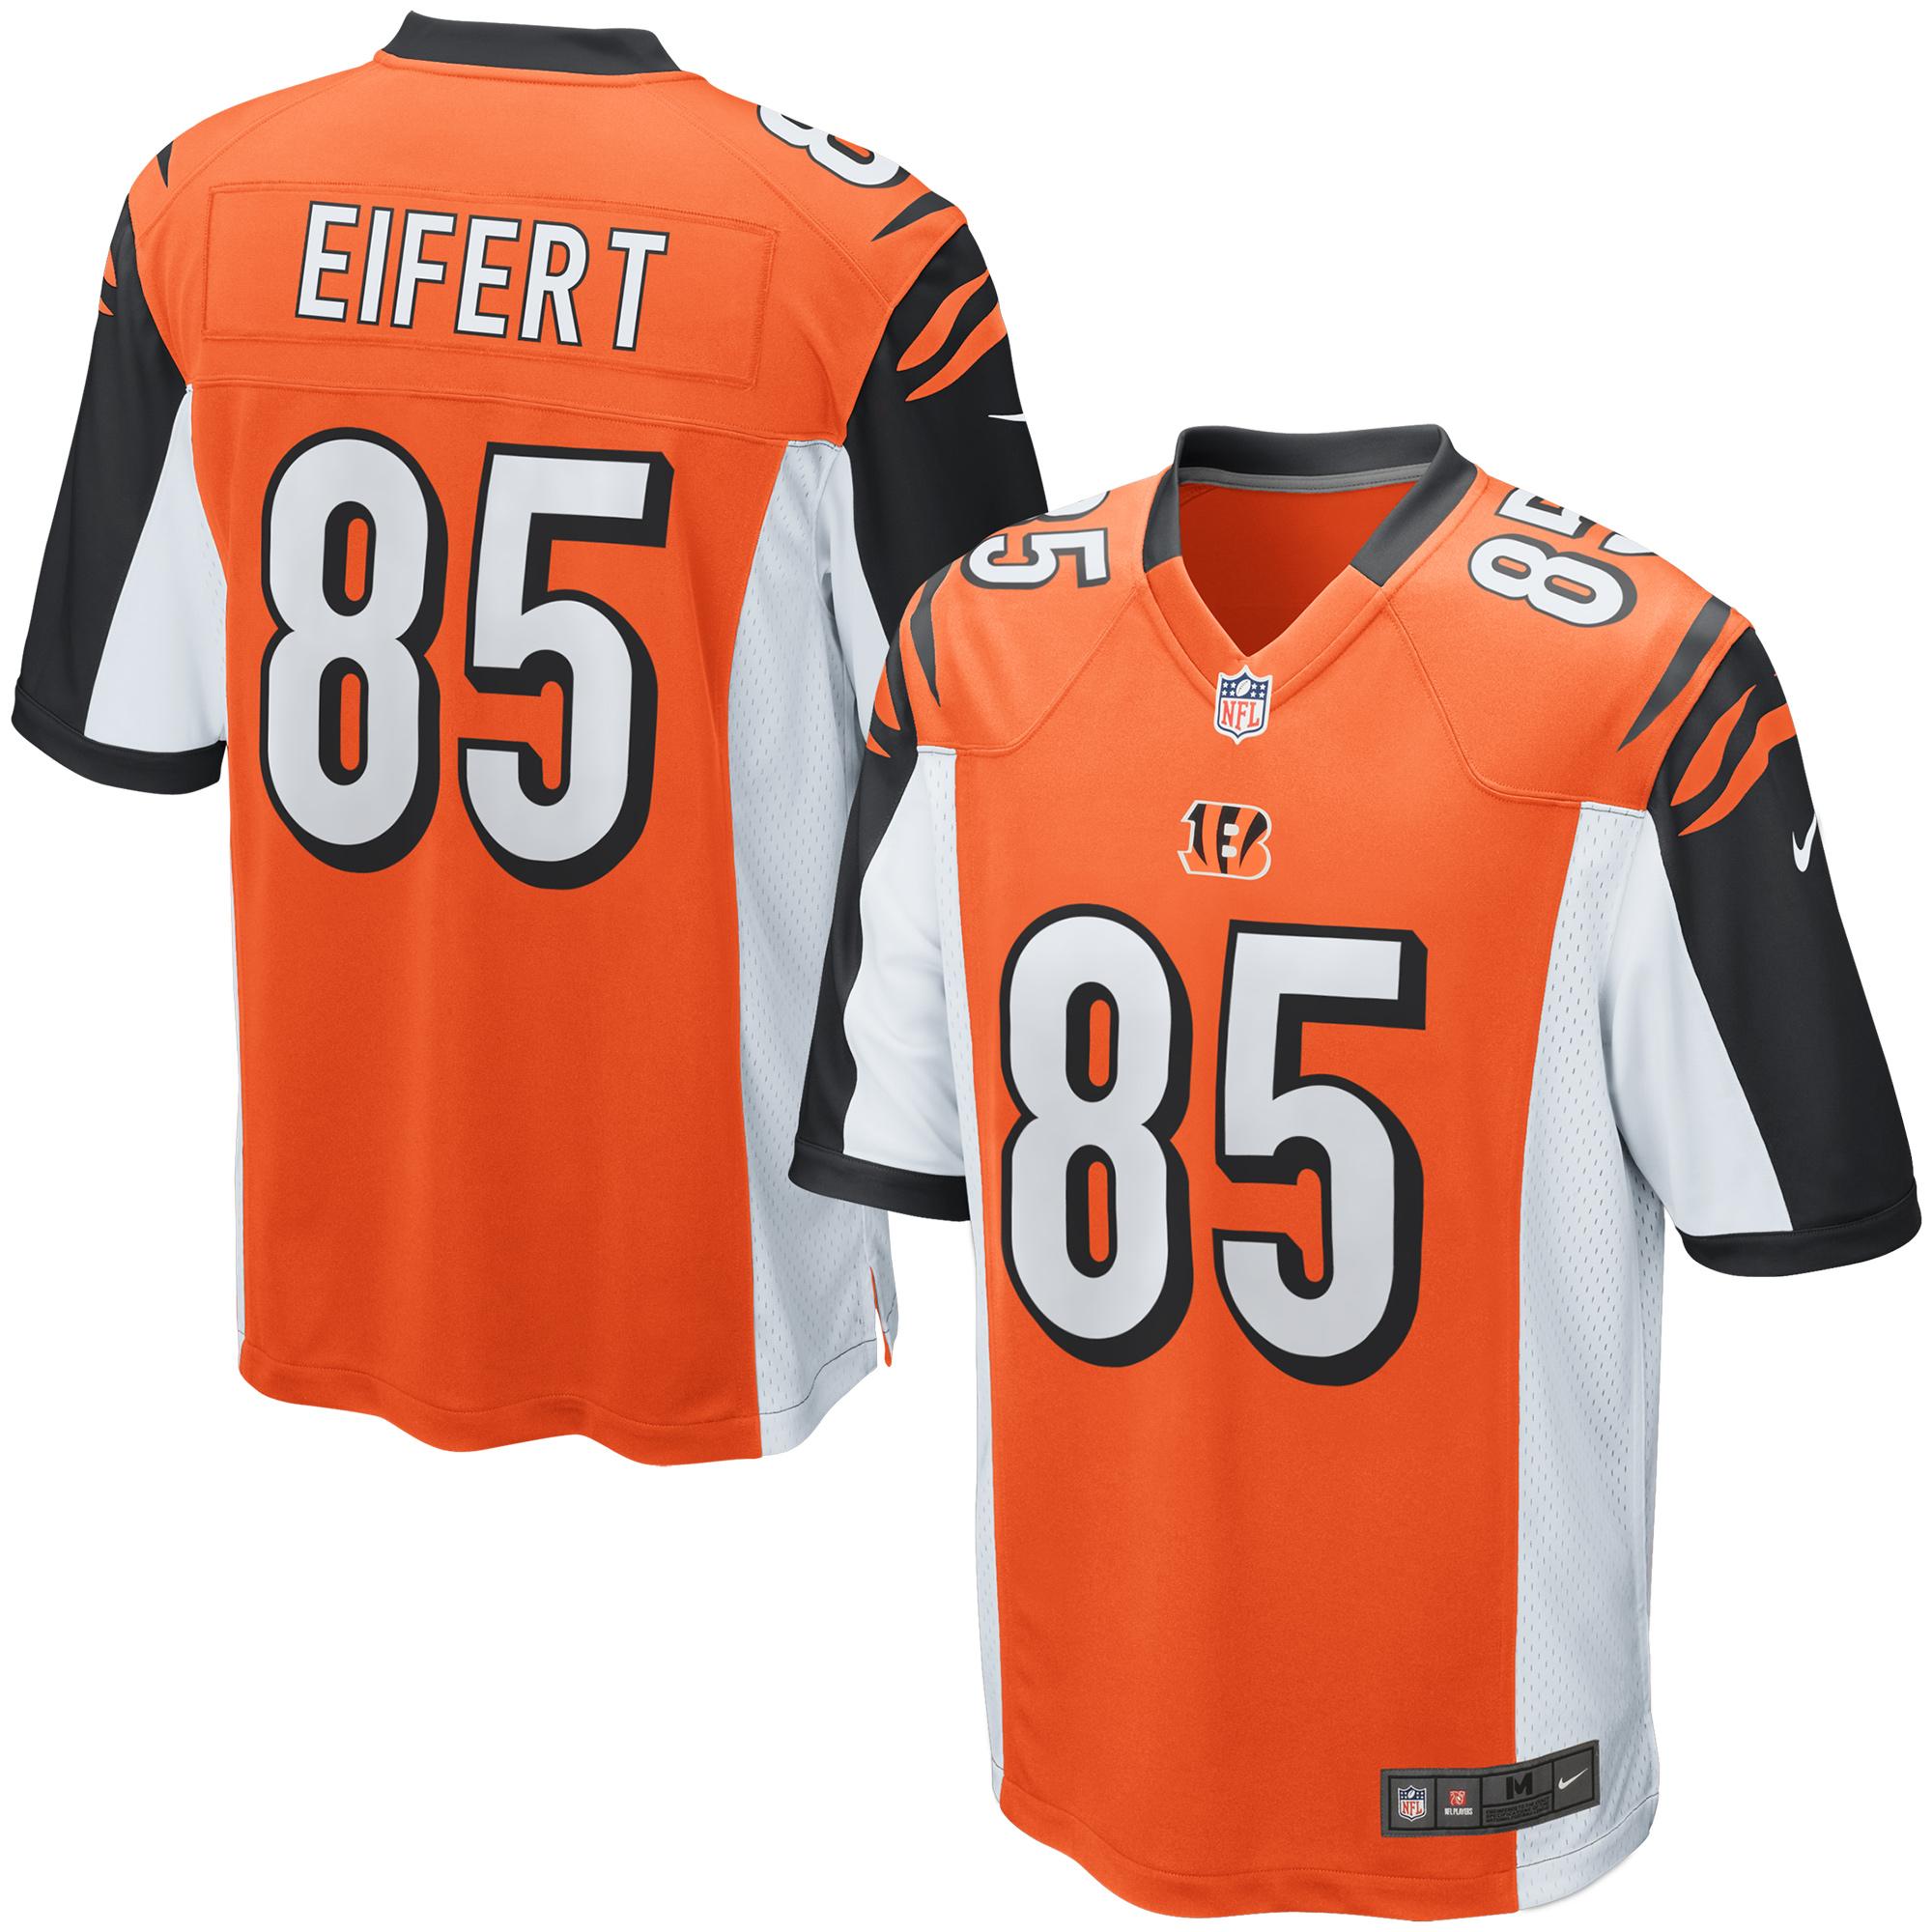 Tyler Eifert Cincinnati Bengals Nike Game Jersey - Orange